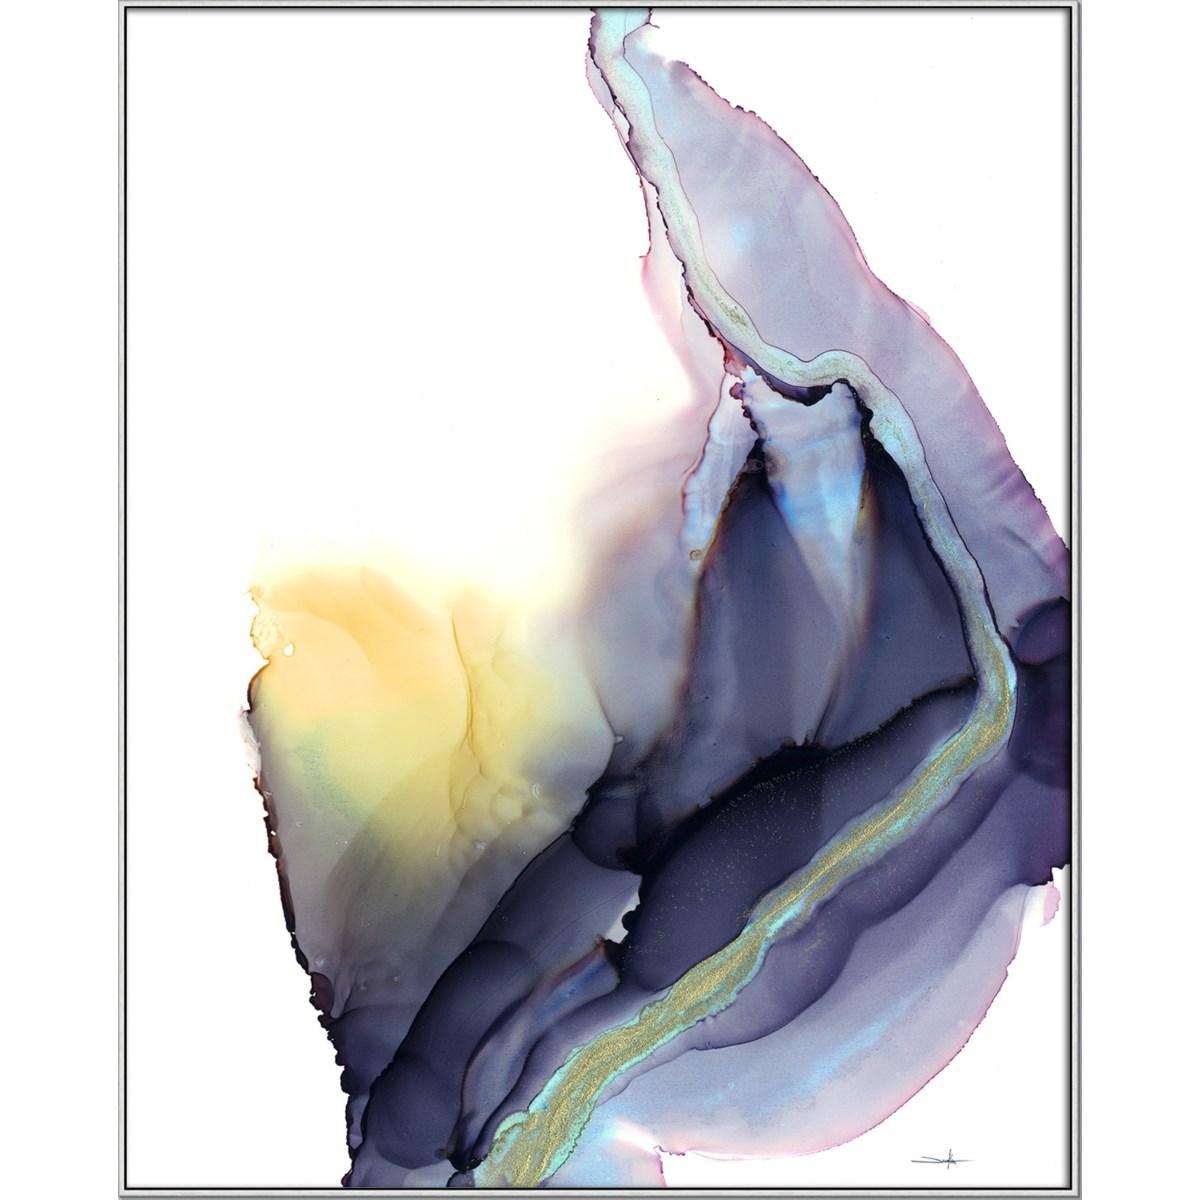 SILENT CHORUS - HIGH GLOSS (framed)